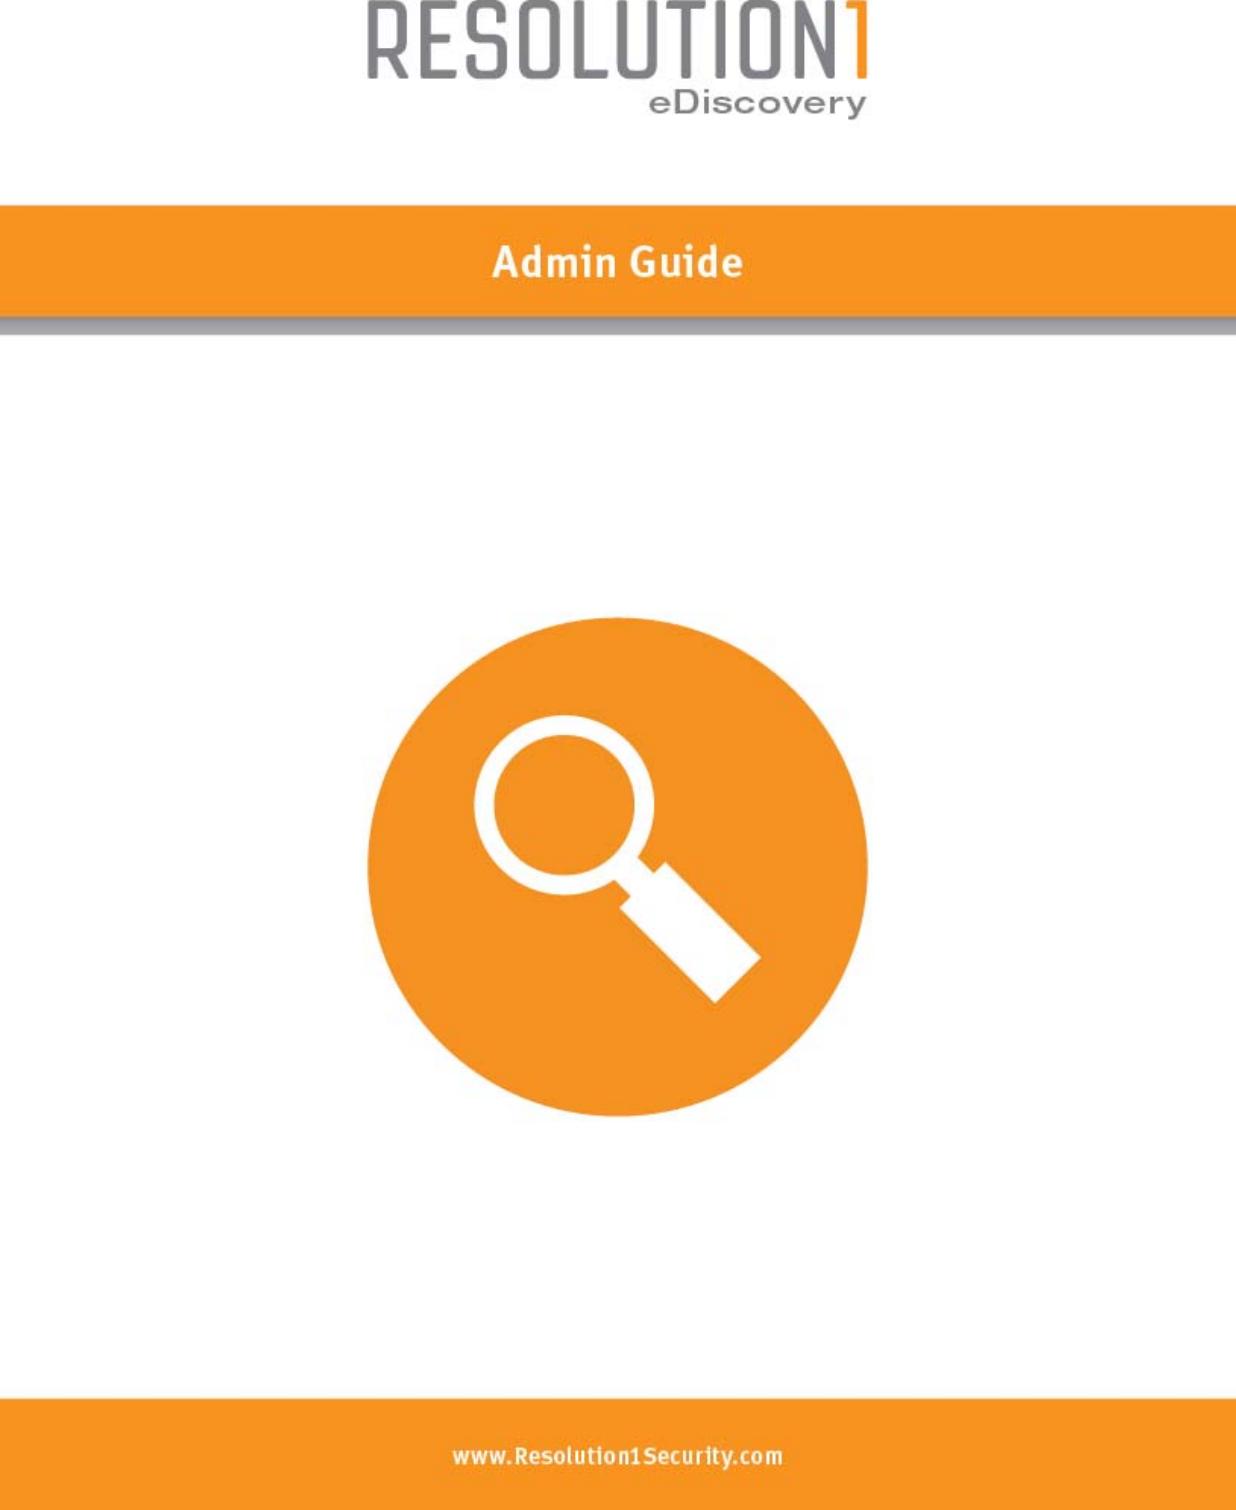 info for 5a3b0 9a12f E Discovery Admin Guide